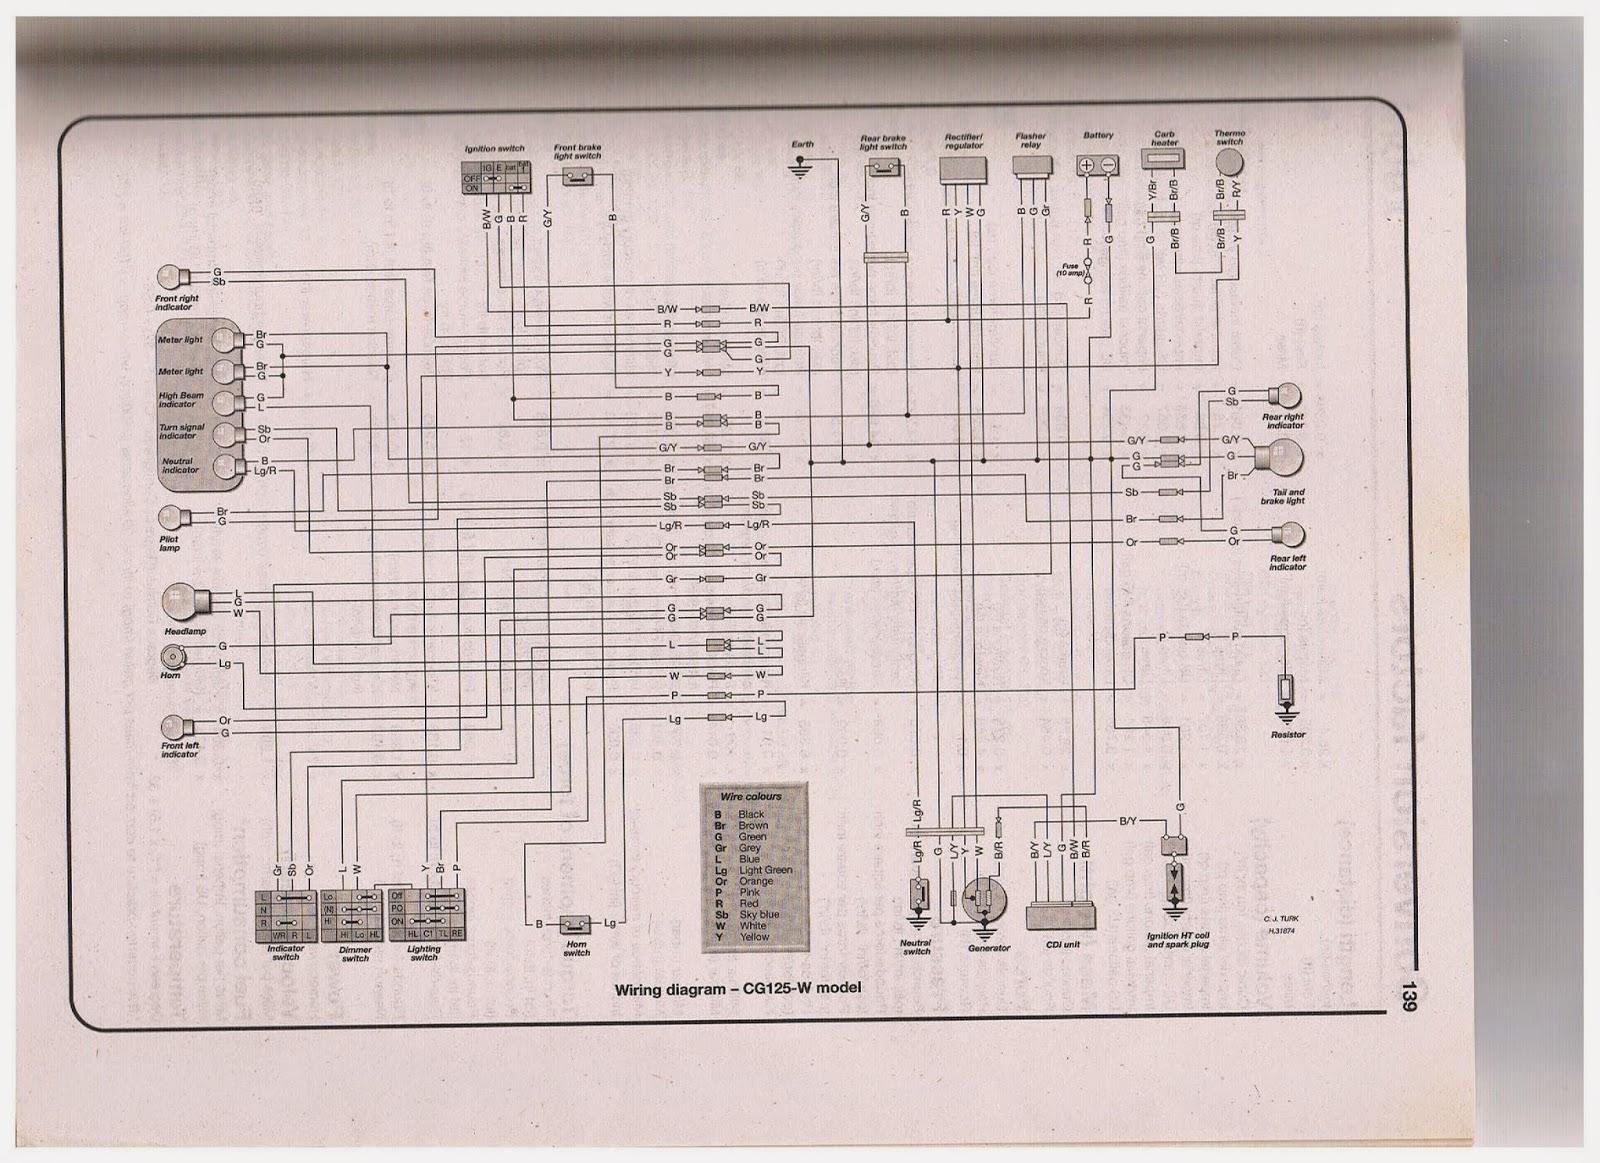 honda cg 125 owner blog honda cg 125 wiring diagrams and honda ridgeline wiring diagram honda [ 1600 x 1163 Pixel ]